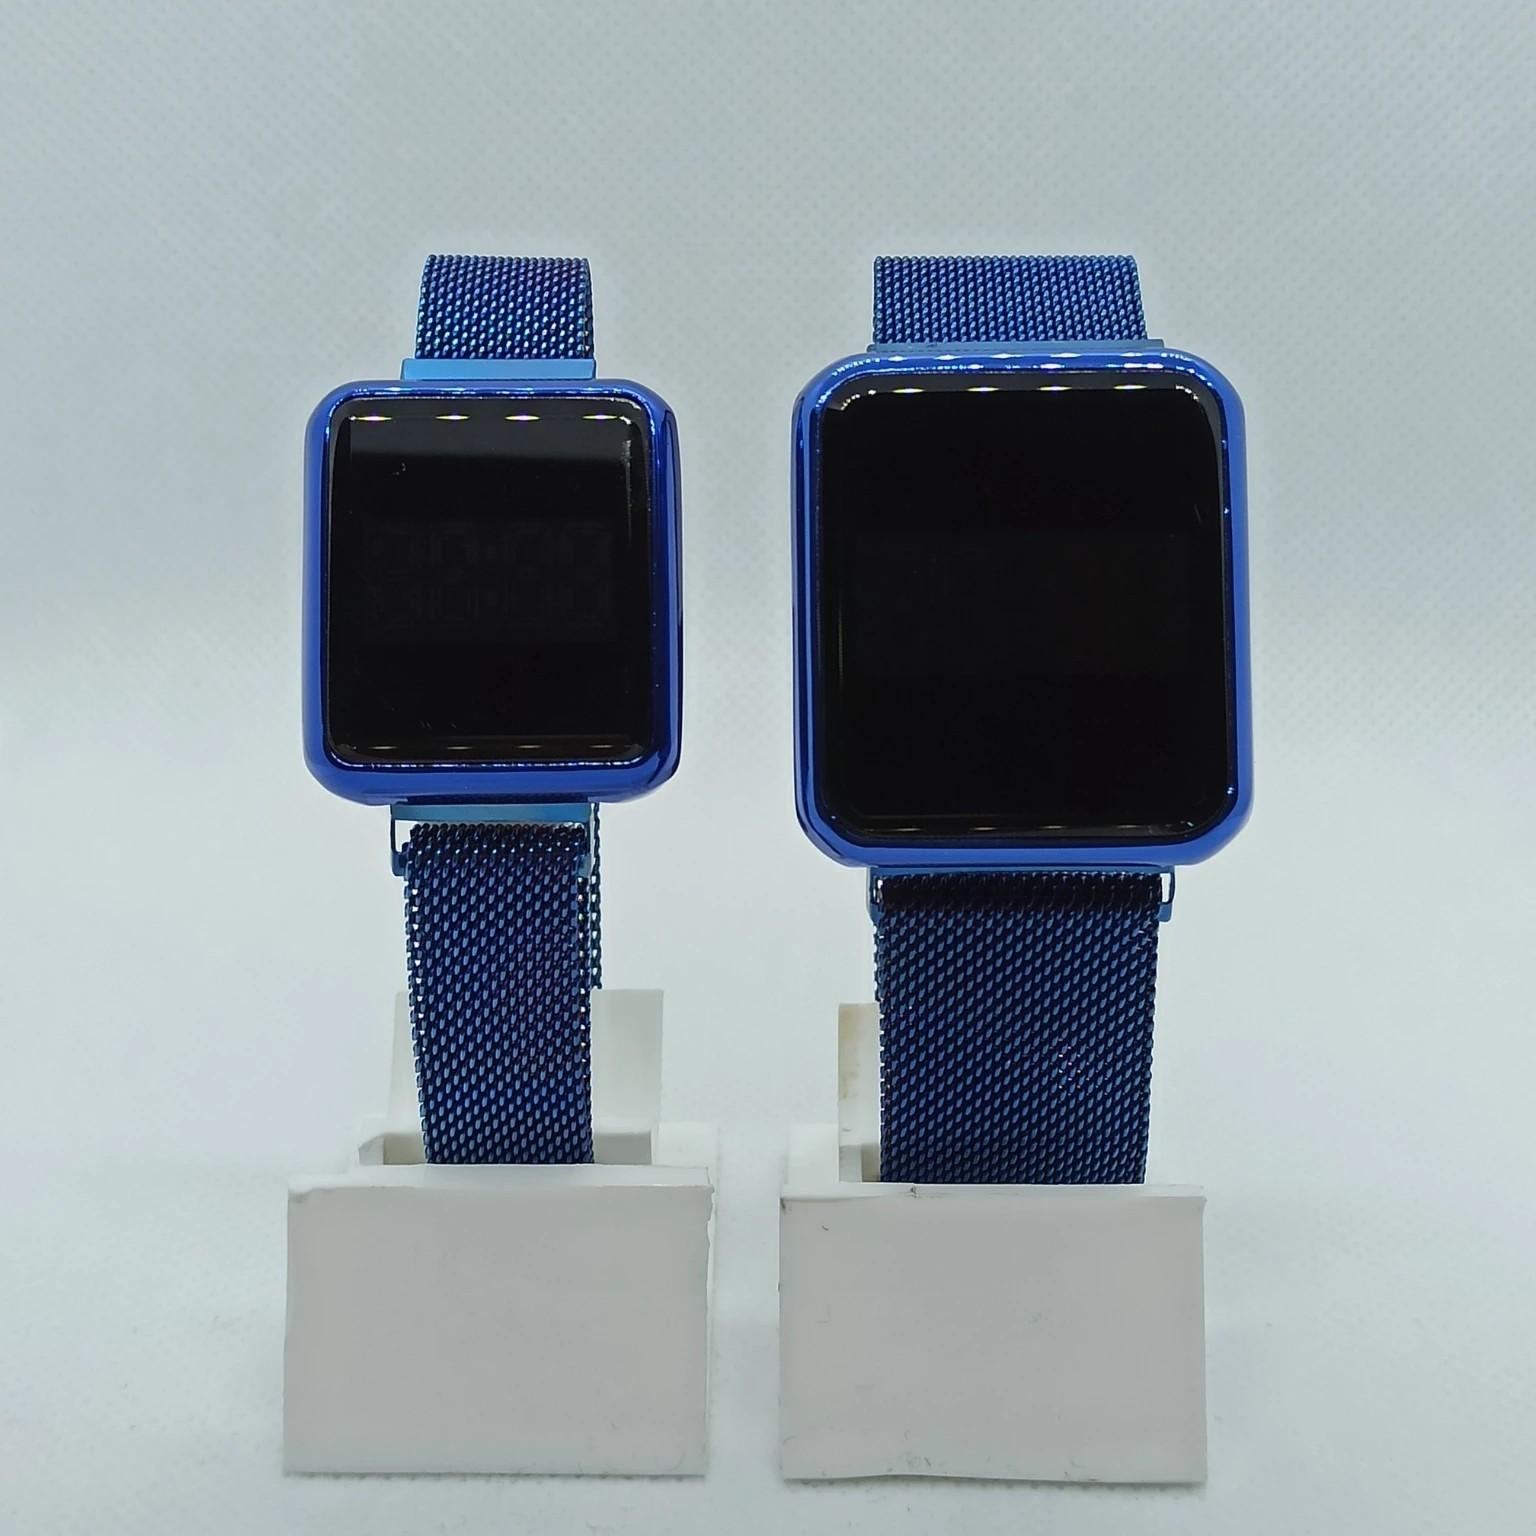 Mavi Dokunmatik Çift Saati